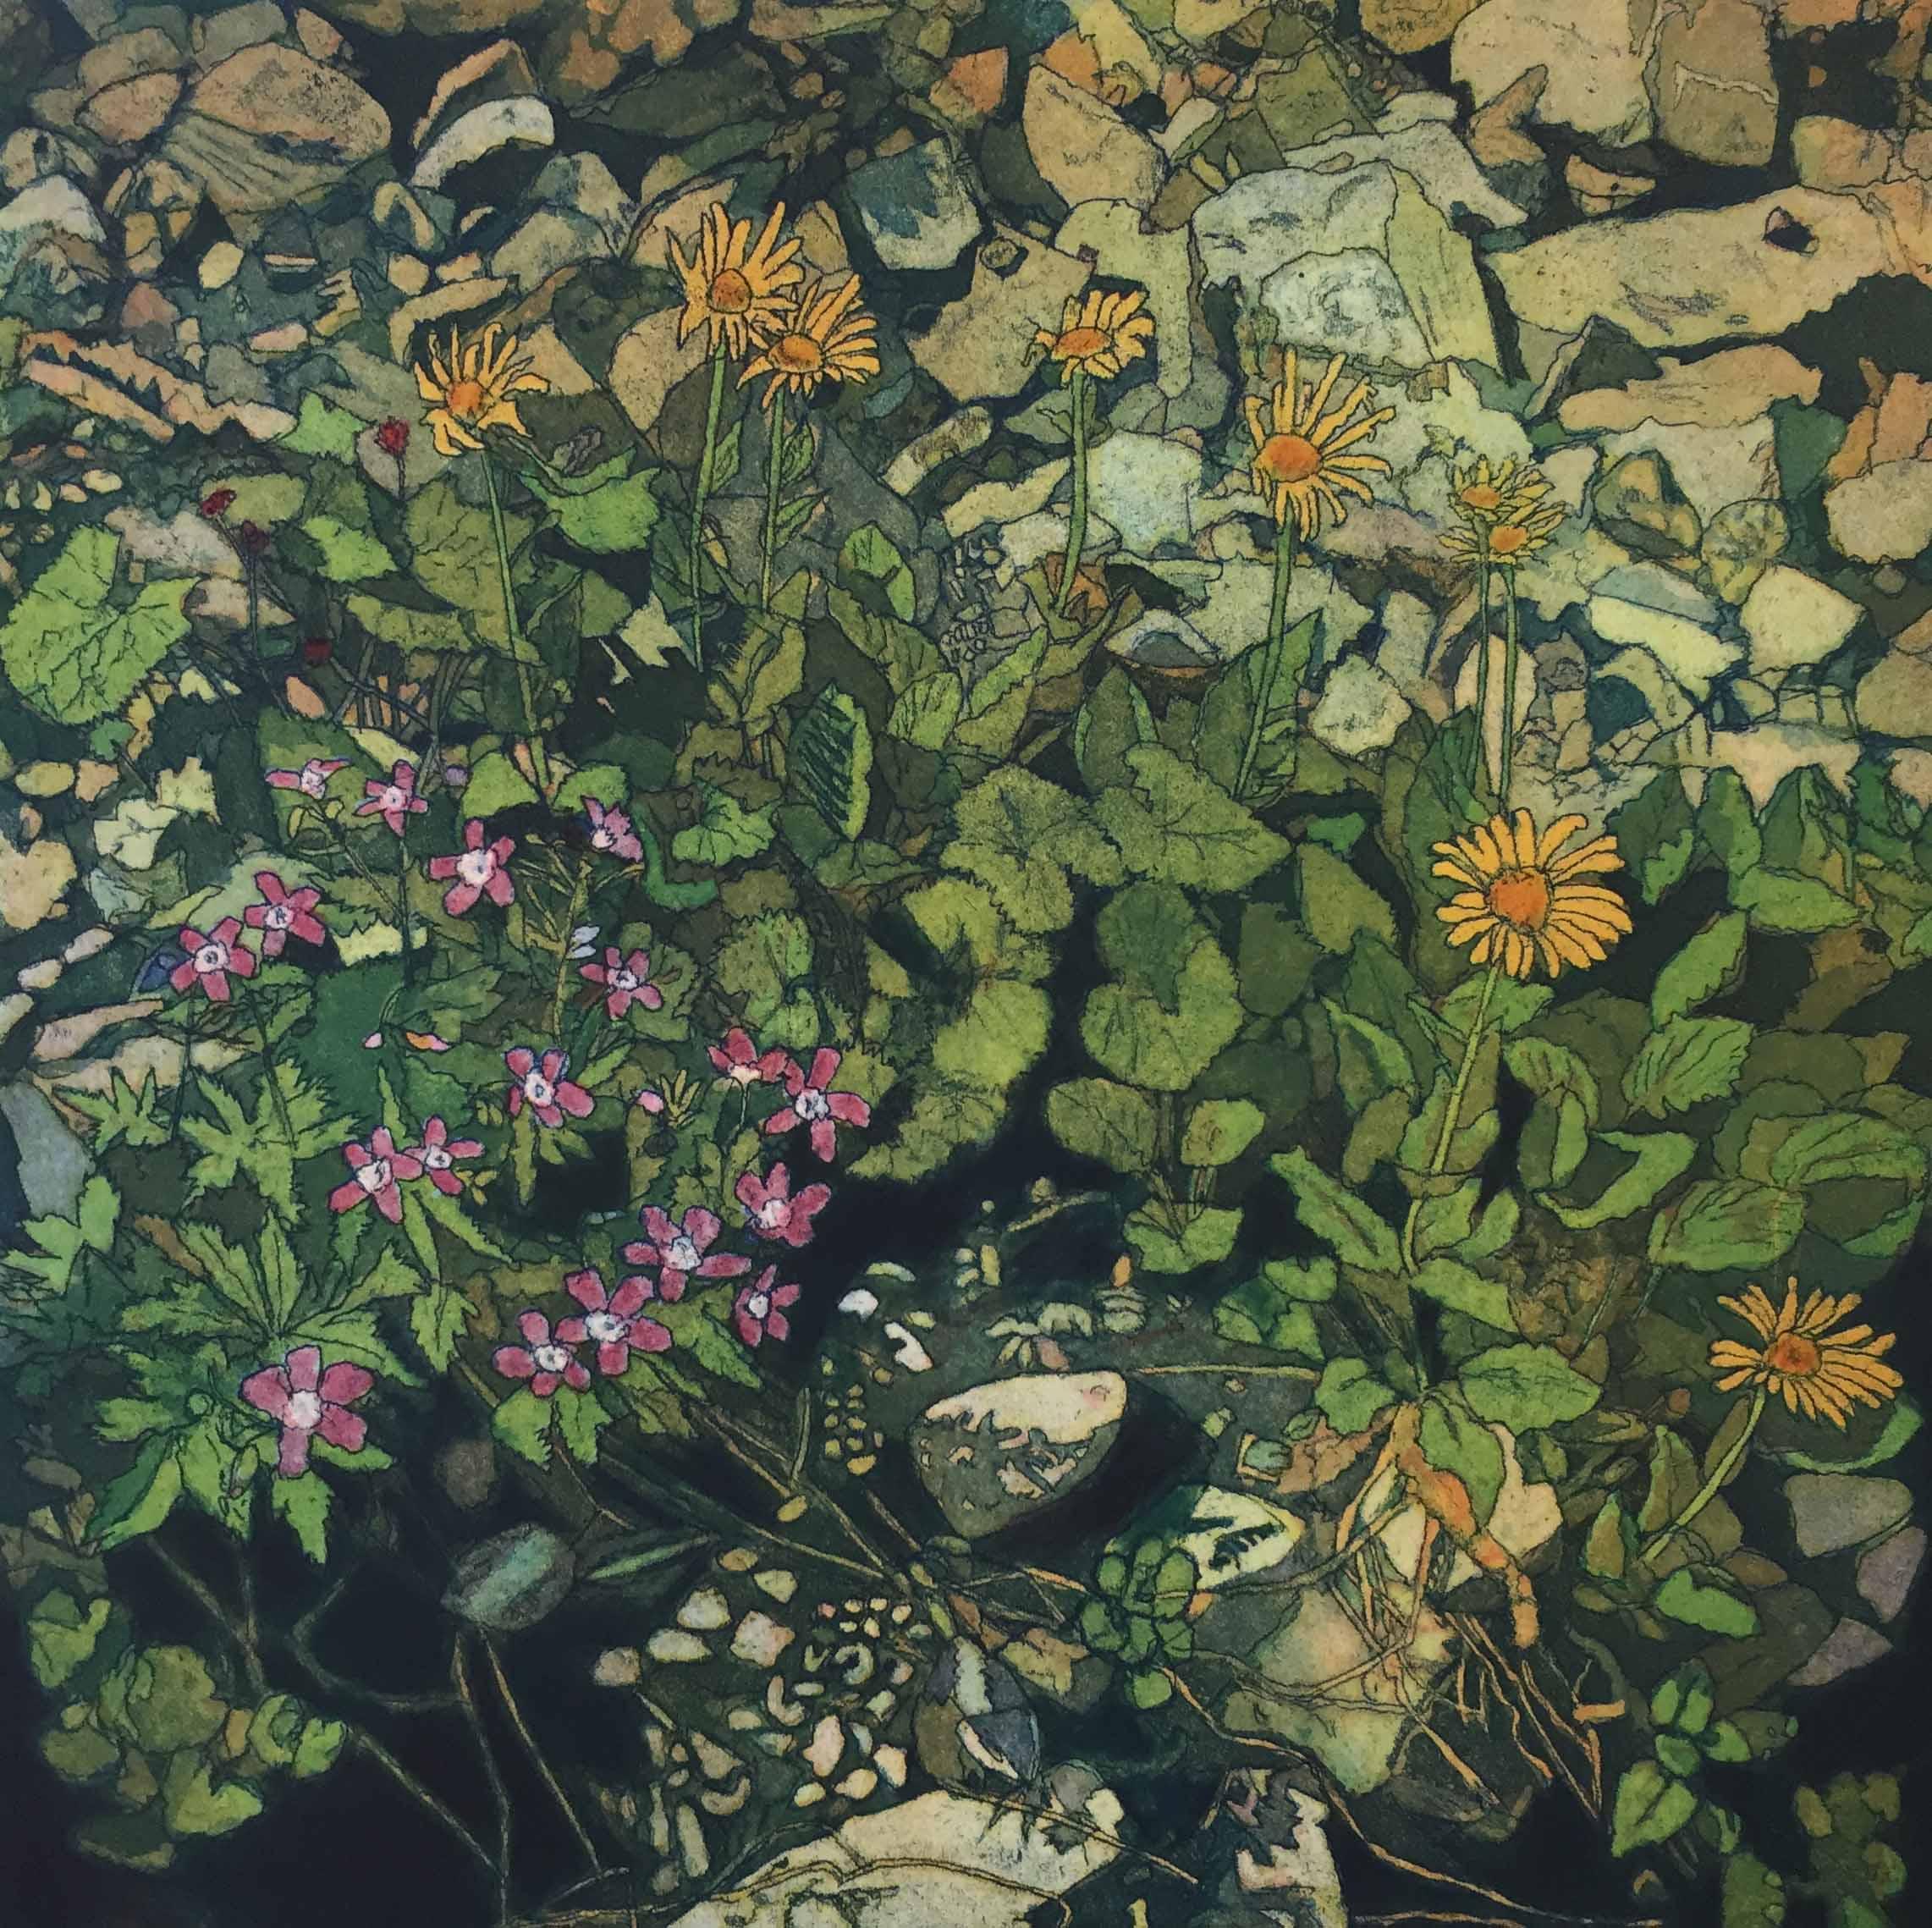 World Views III: Swiss Wildflowers